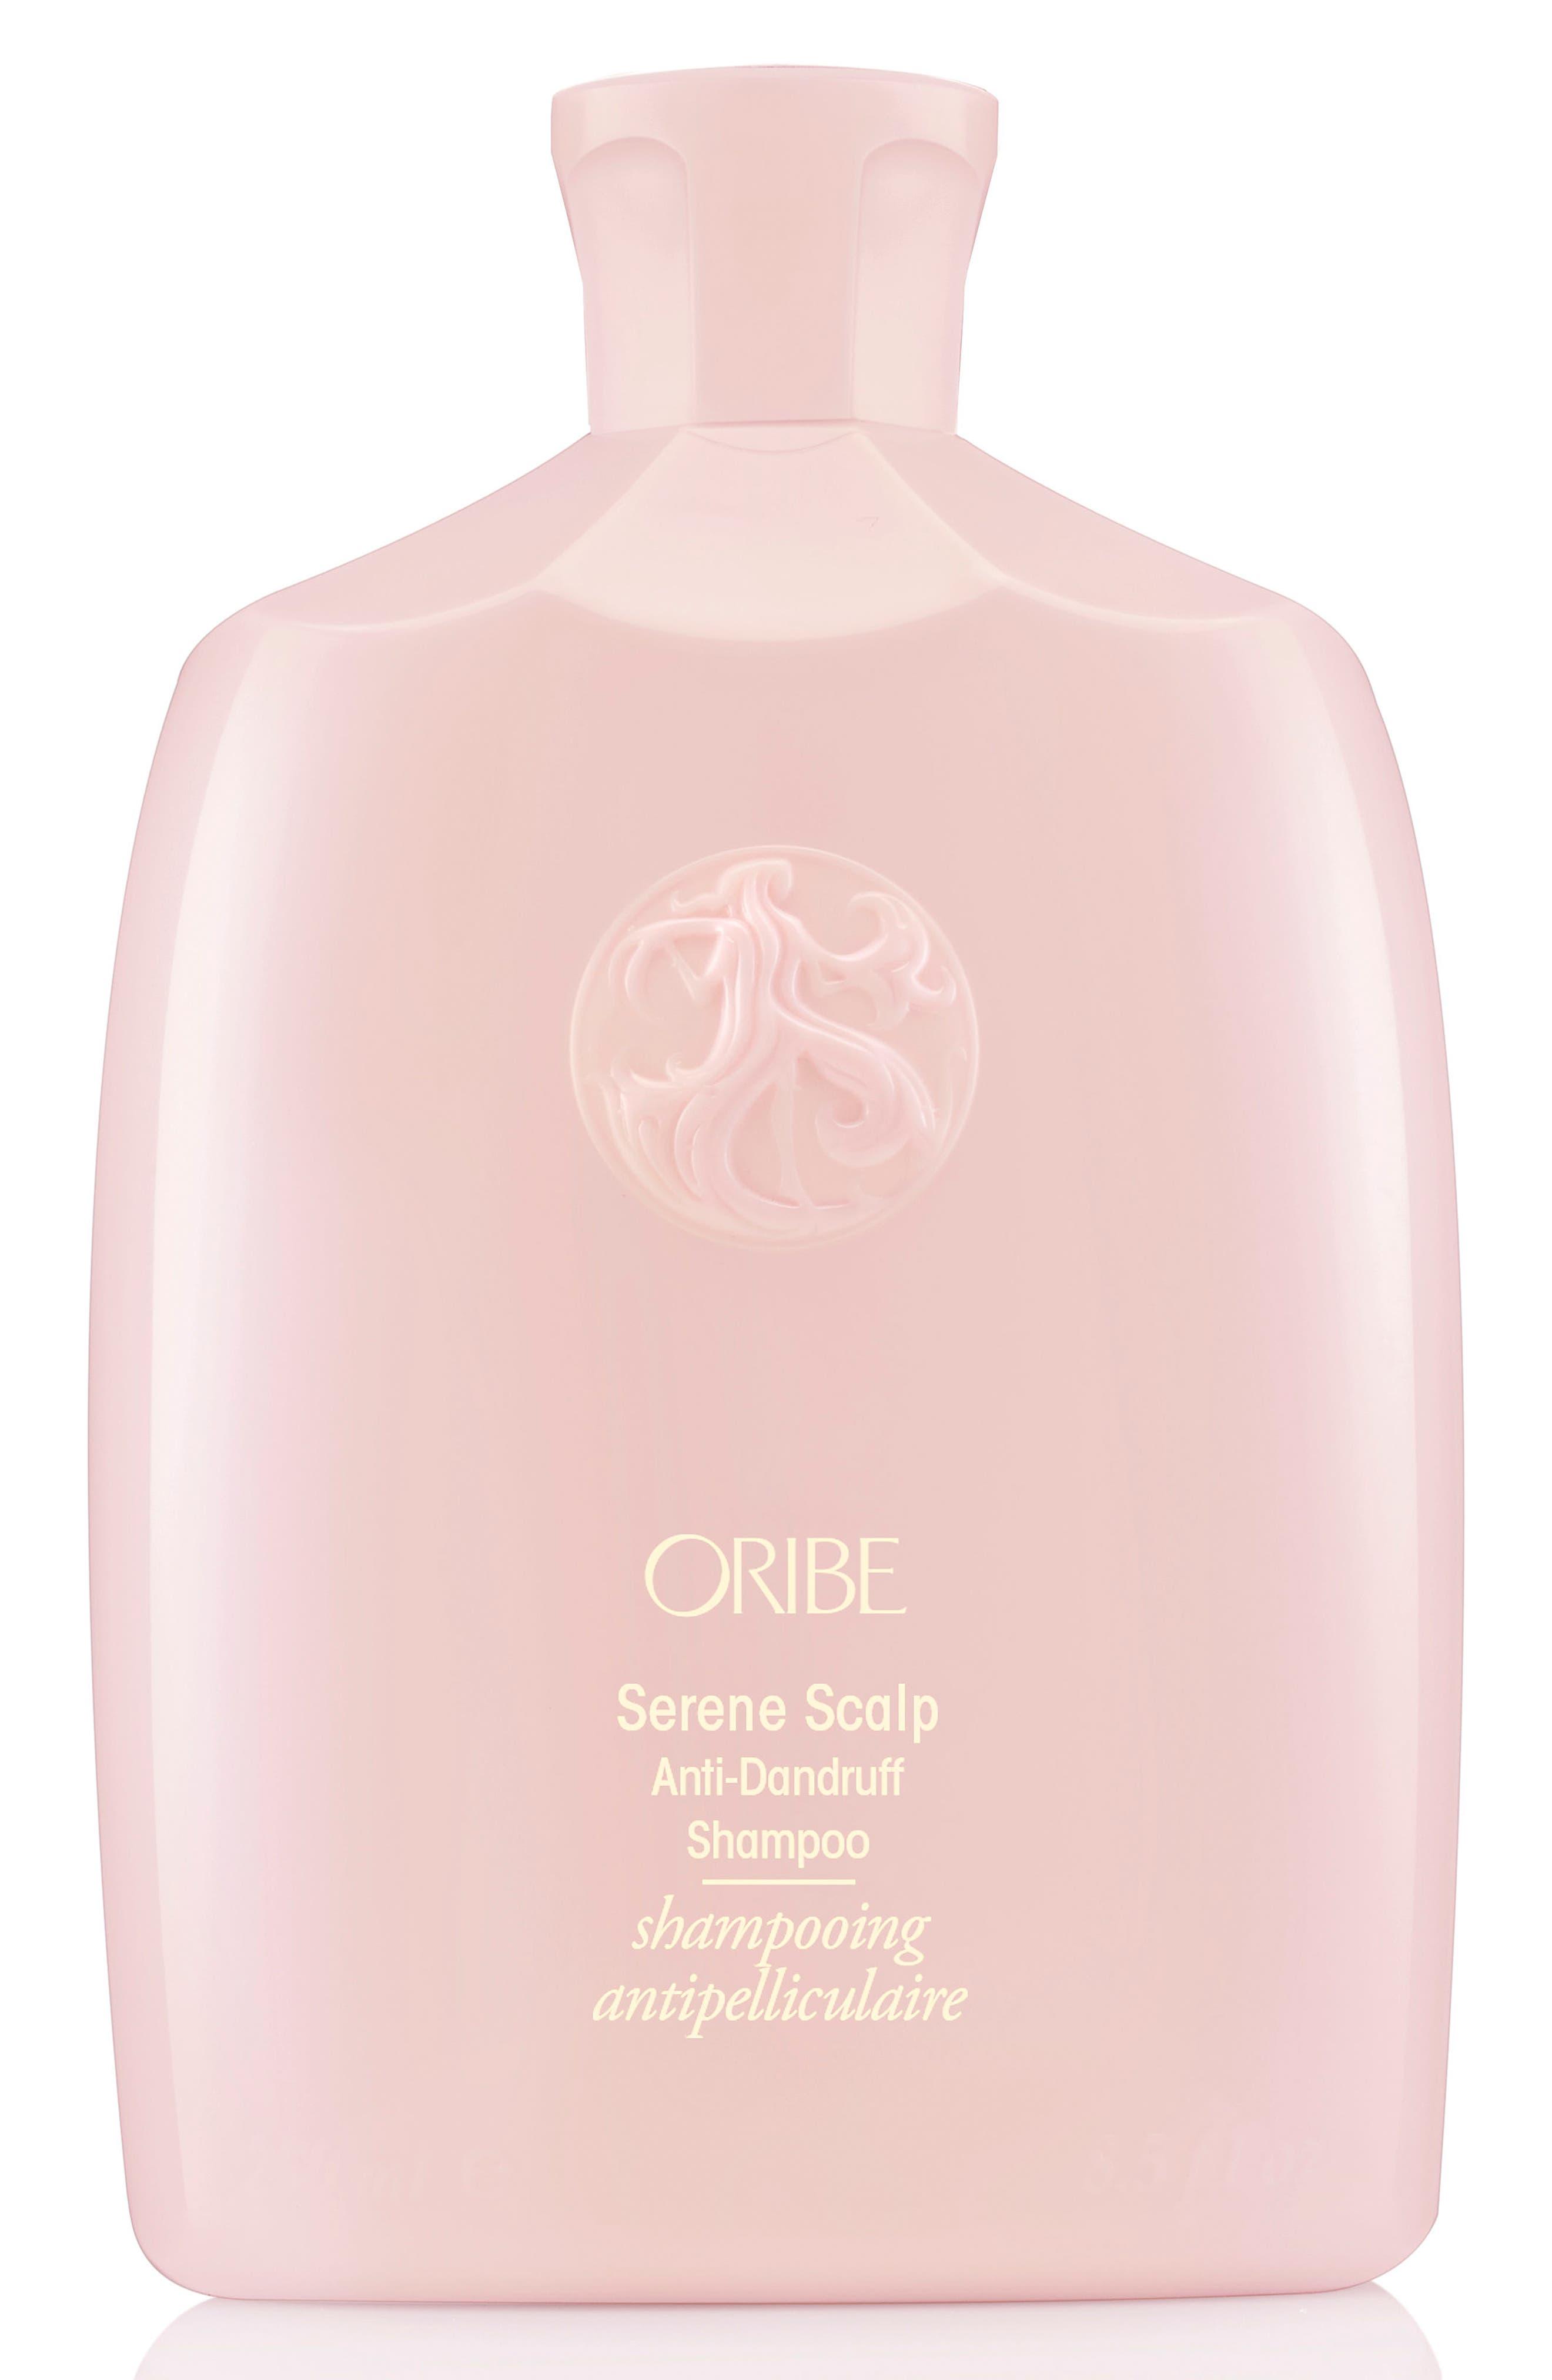 SPACE.NK.apothecary Oribe Serene Scalp Anti-Dandruff Shampoo